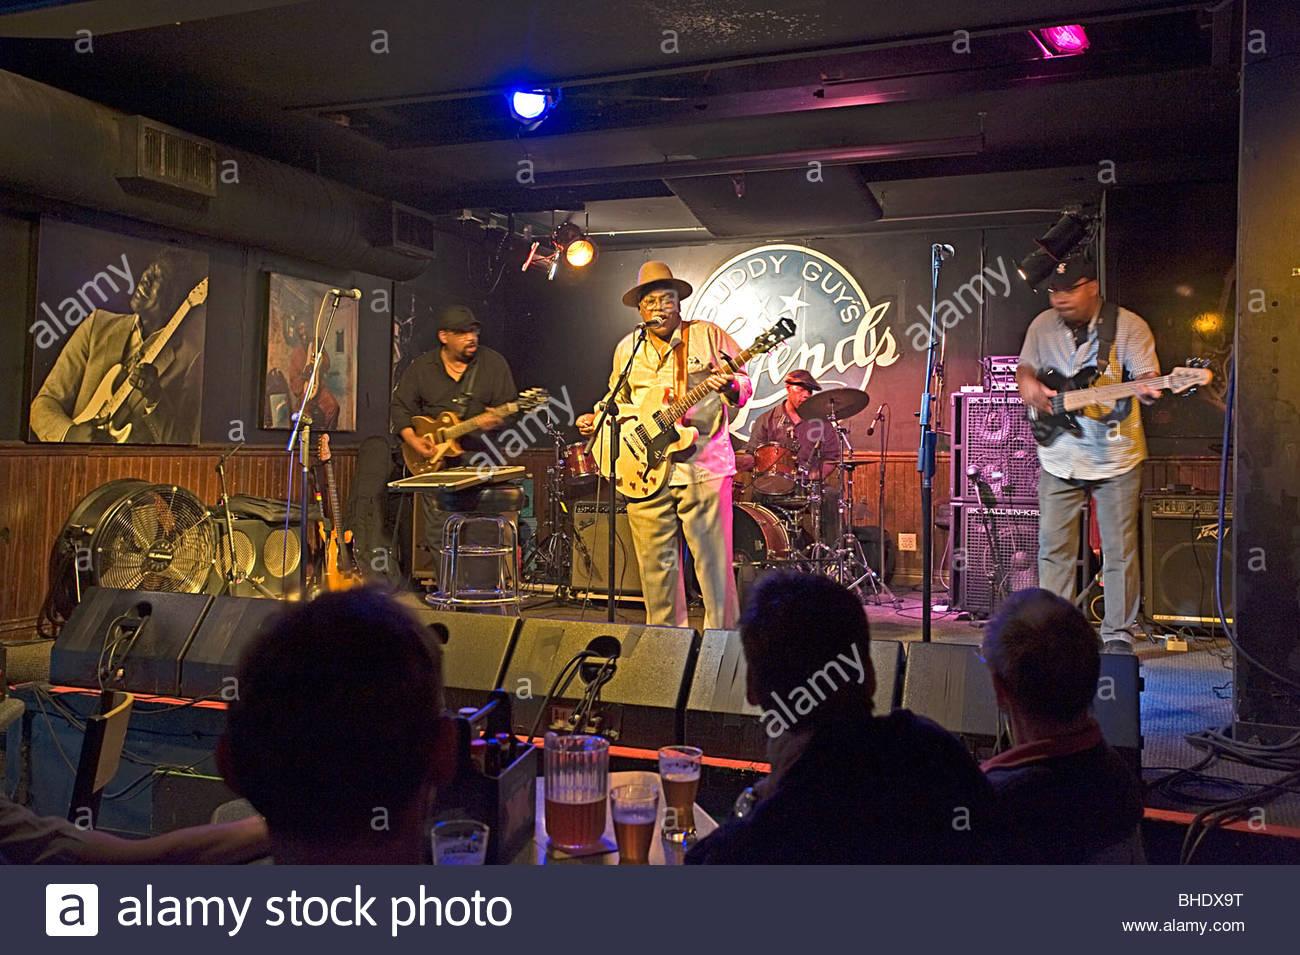 Jimmy Burns erklingt in der berühmten Buddy Guy Legenden blues Club im Bereich South Loop. Chicago, Illinois, Stockbild